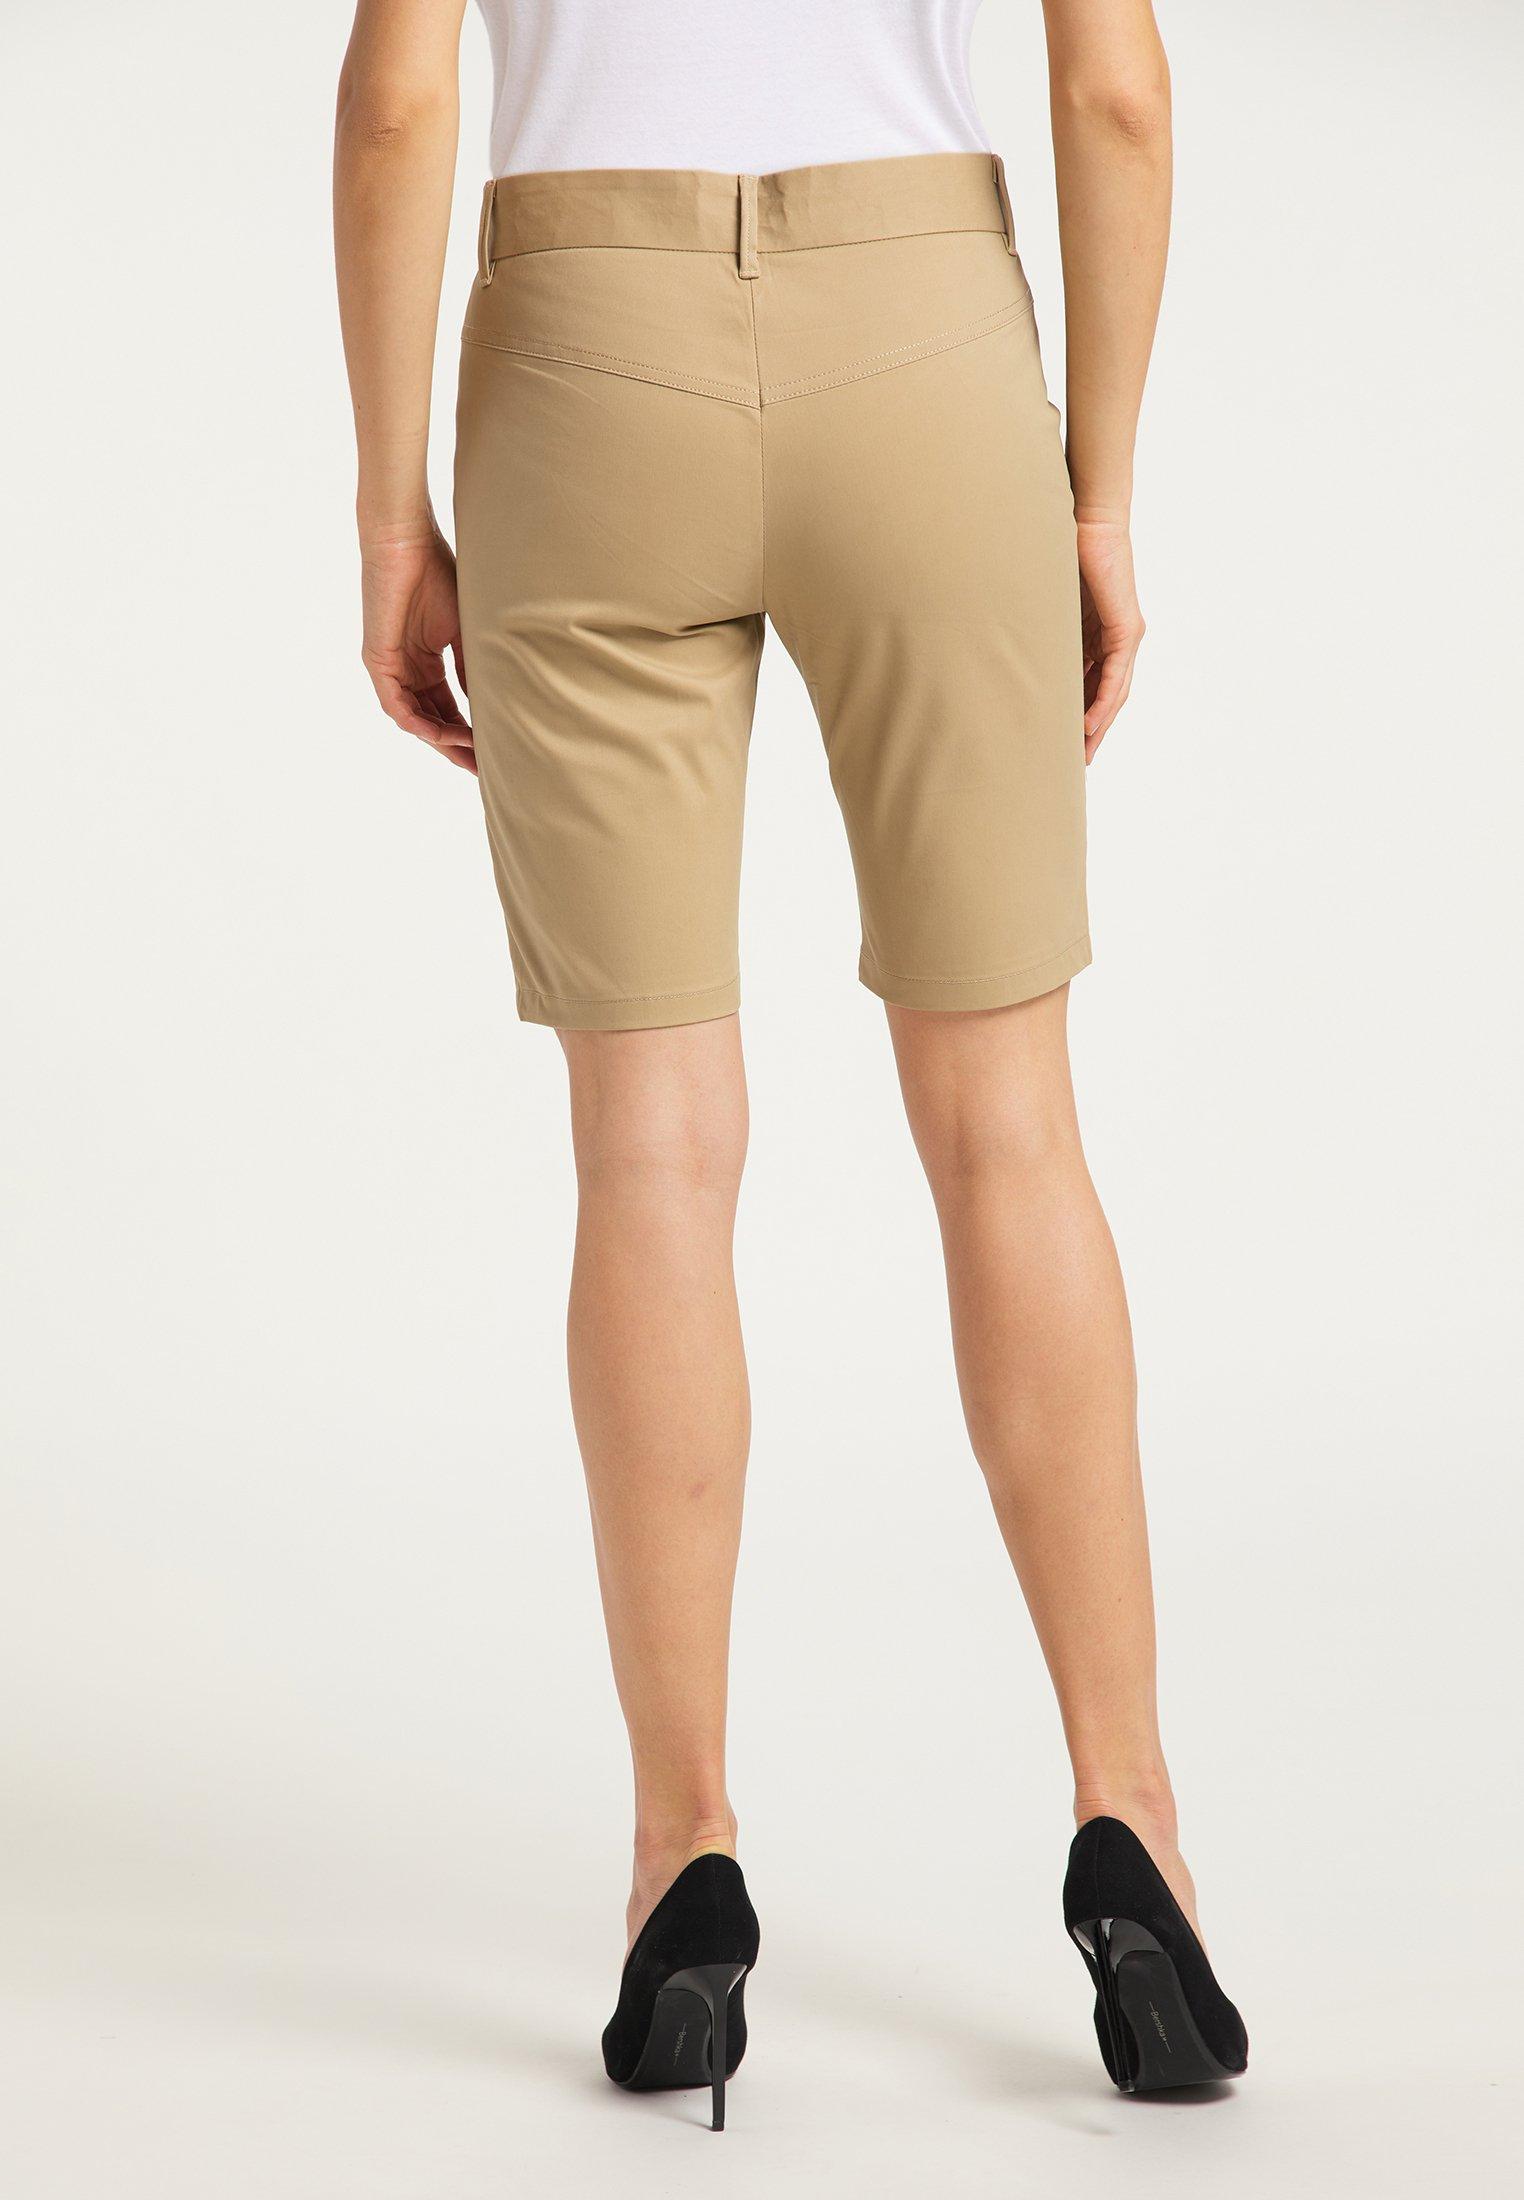 The Cheapest Women's Clothing DreiMaster Shorts hellsand Zt2QBULNj